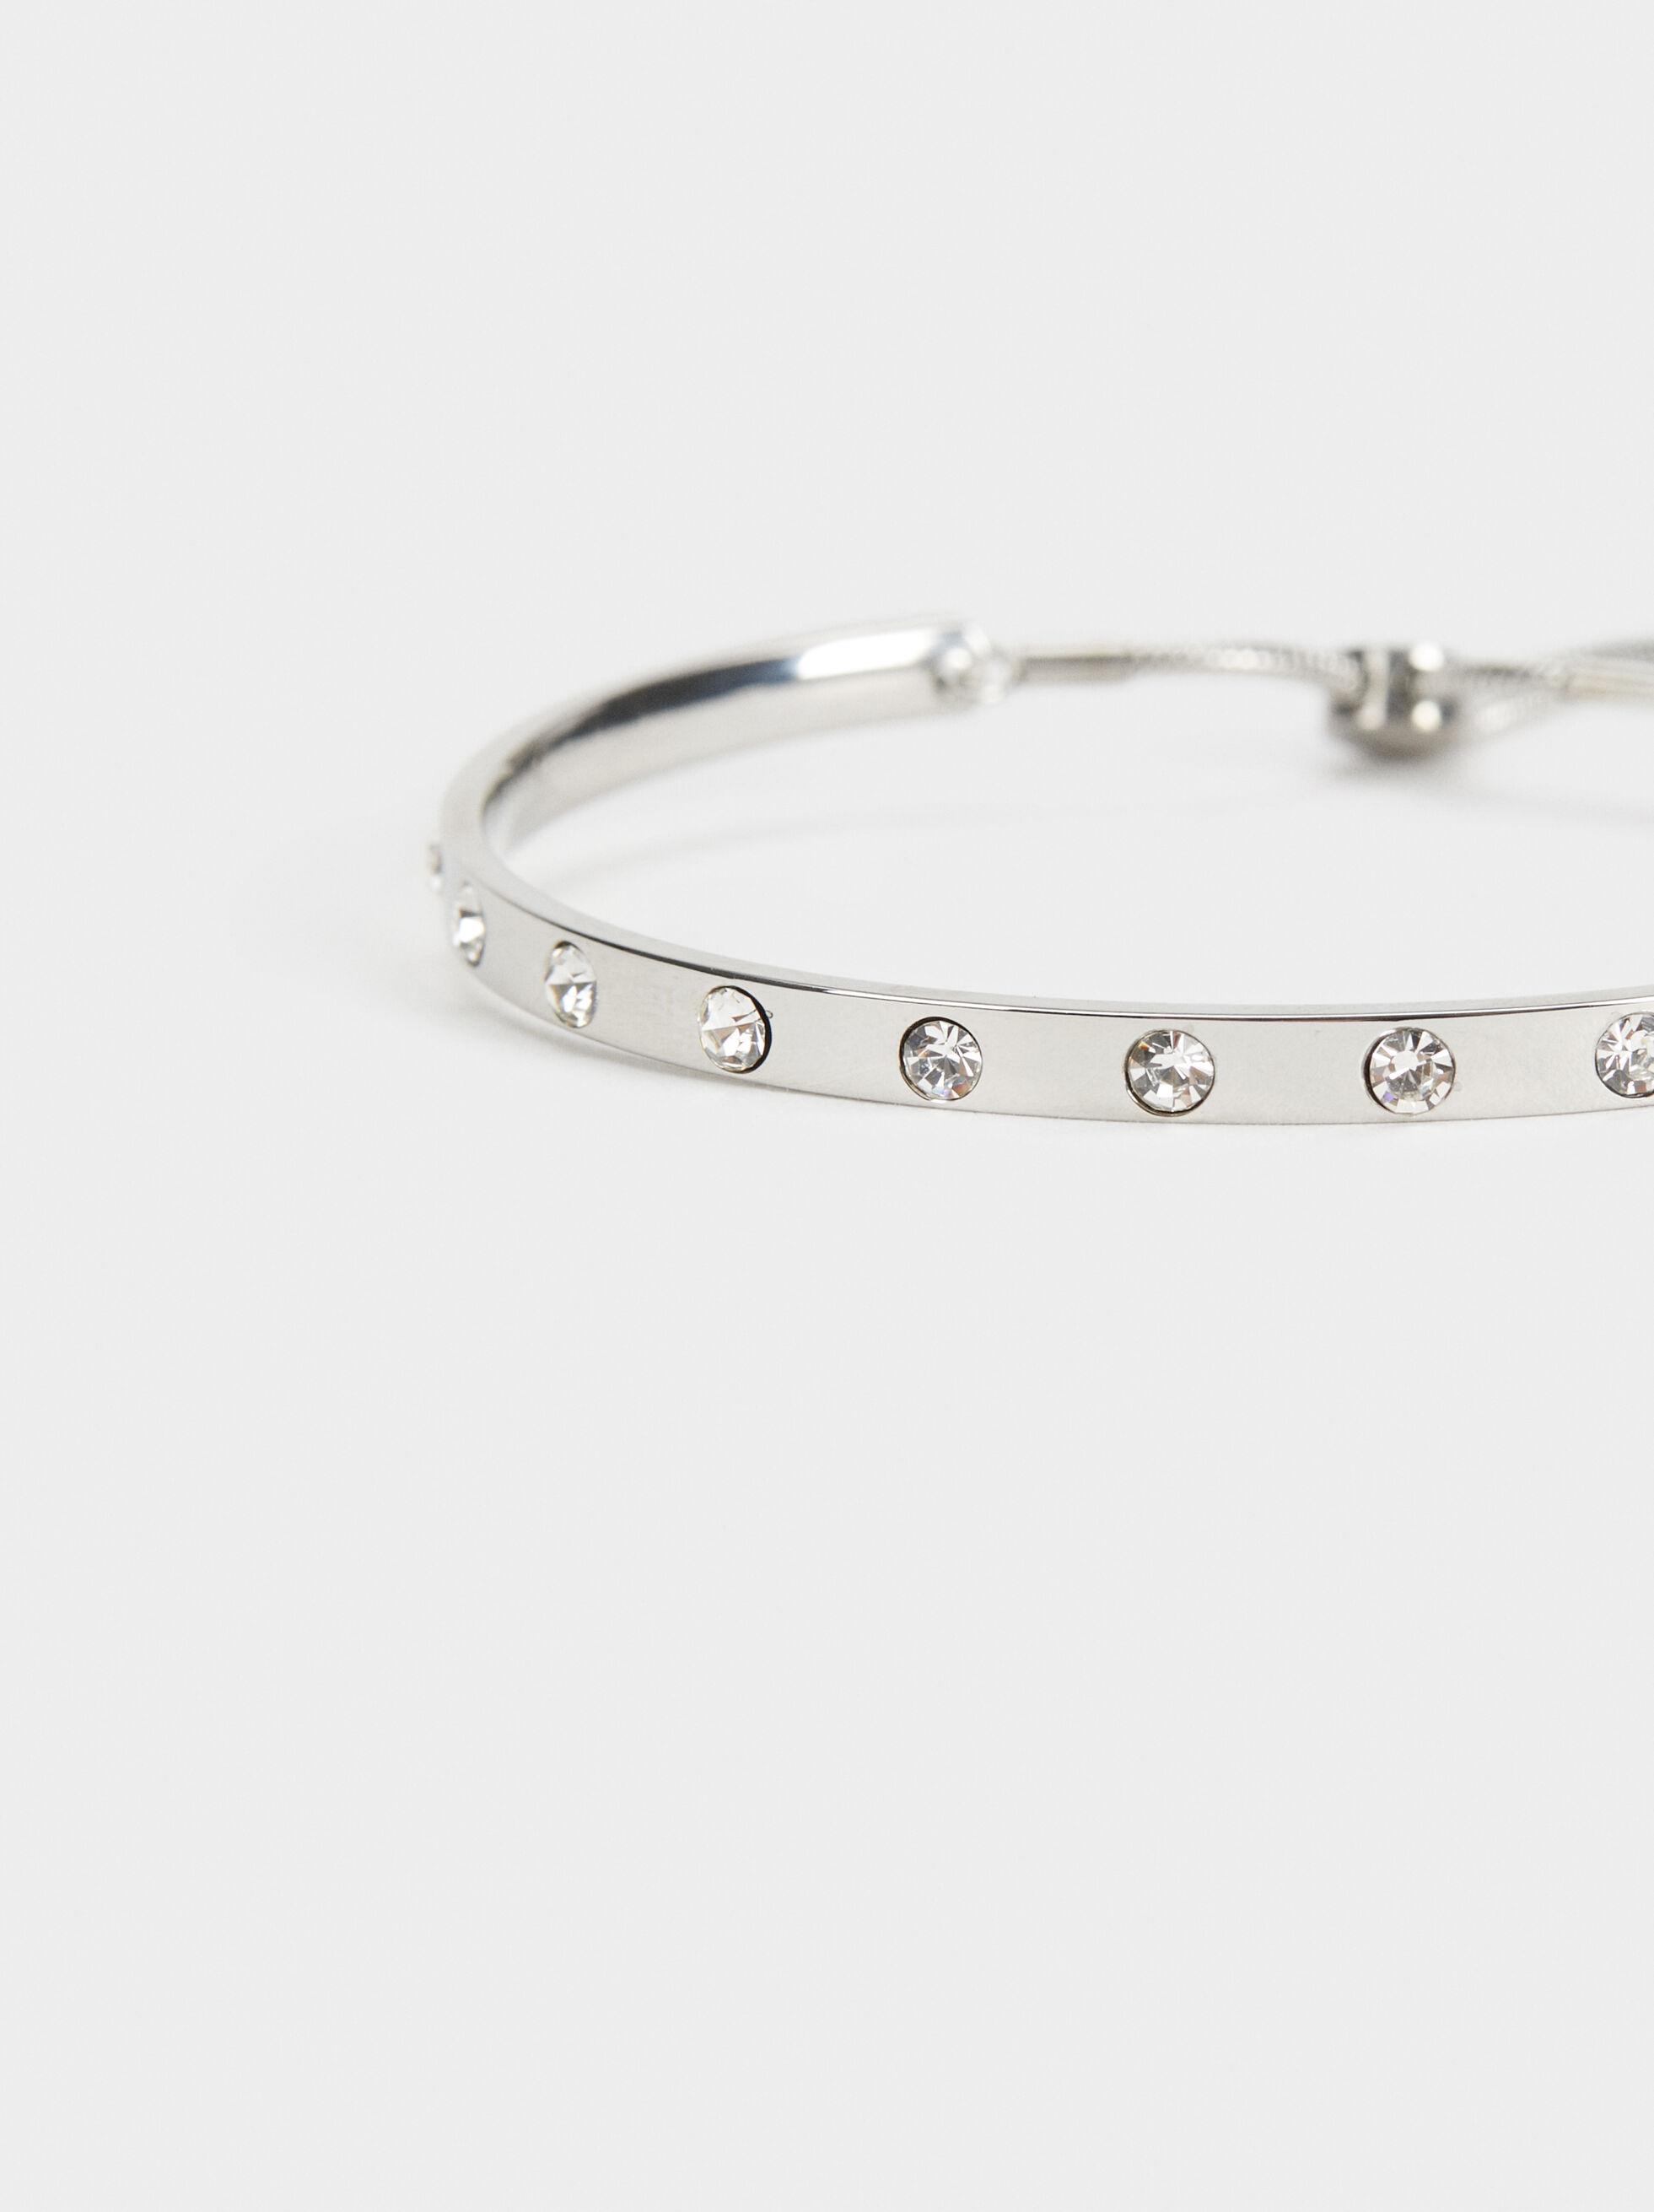 Steel Adjustable Bracelet With Rhinestones, Silver, hi-res